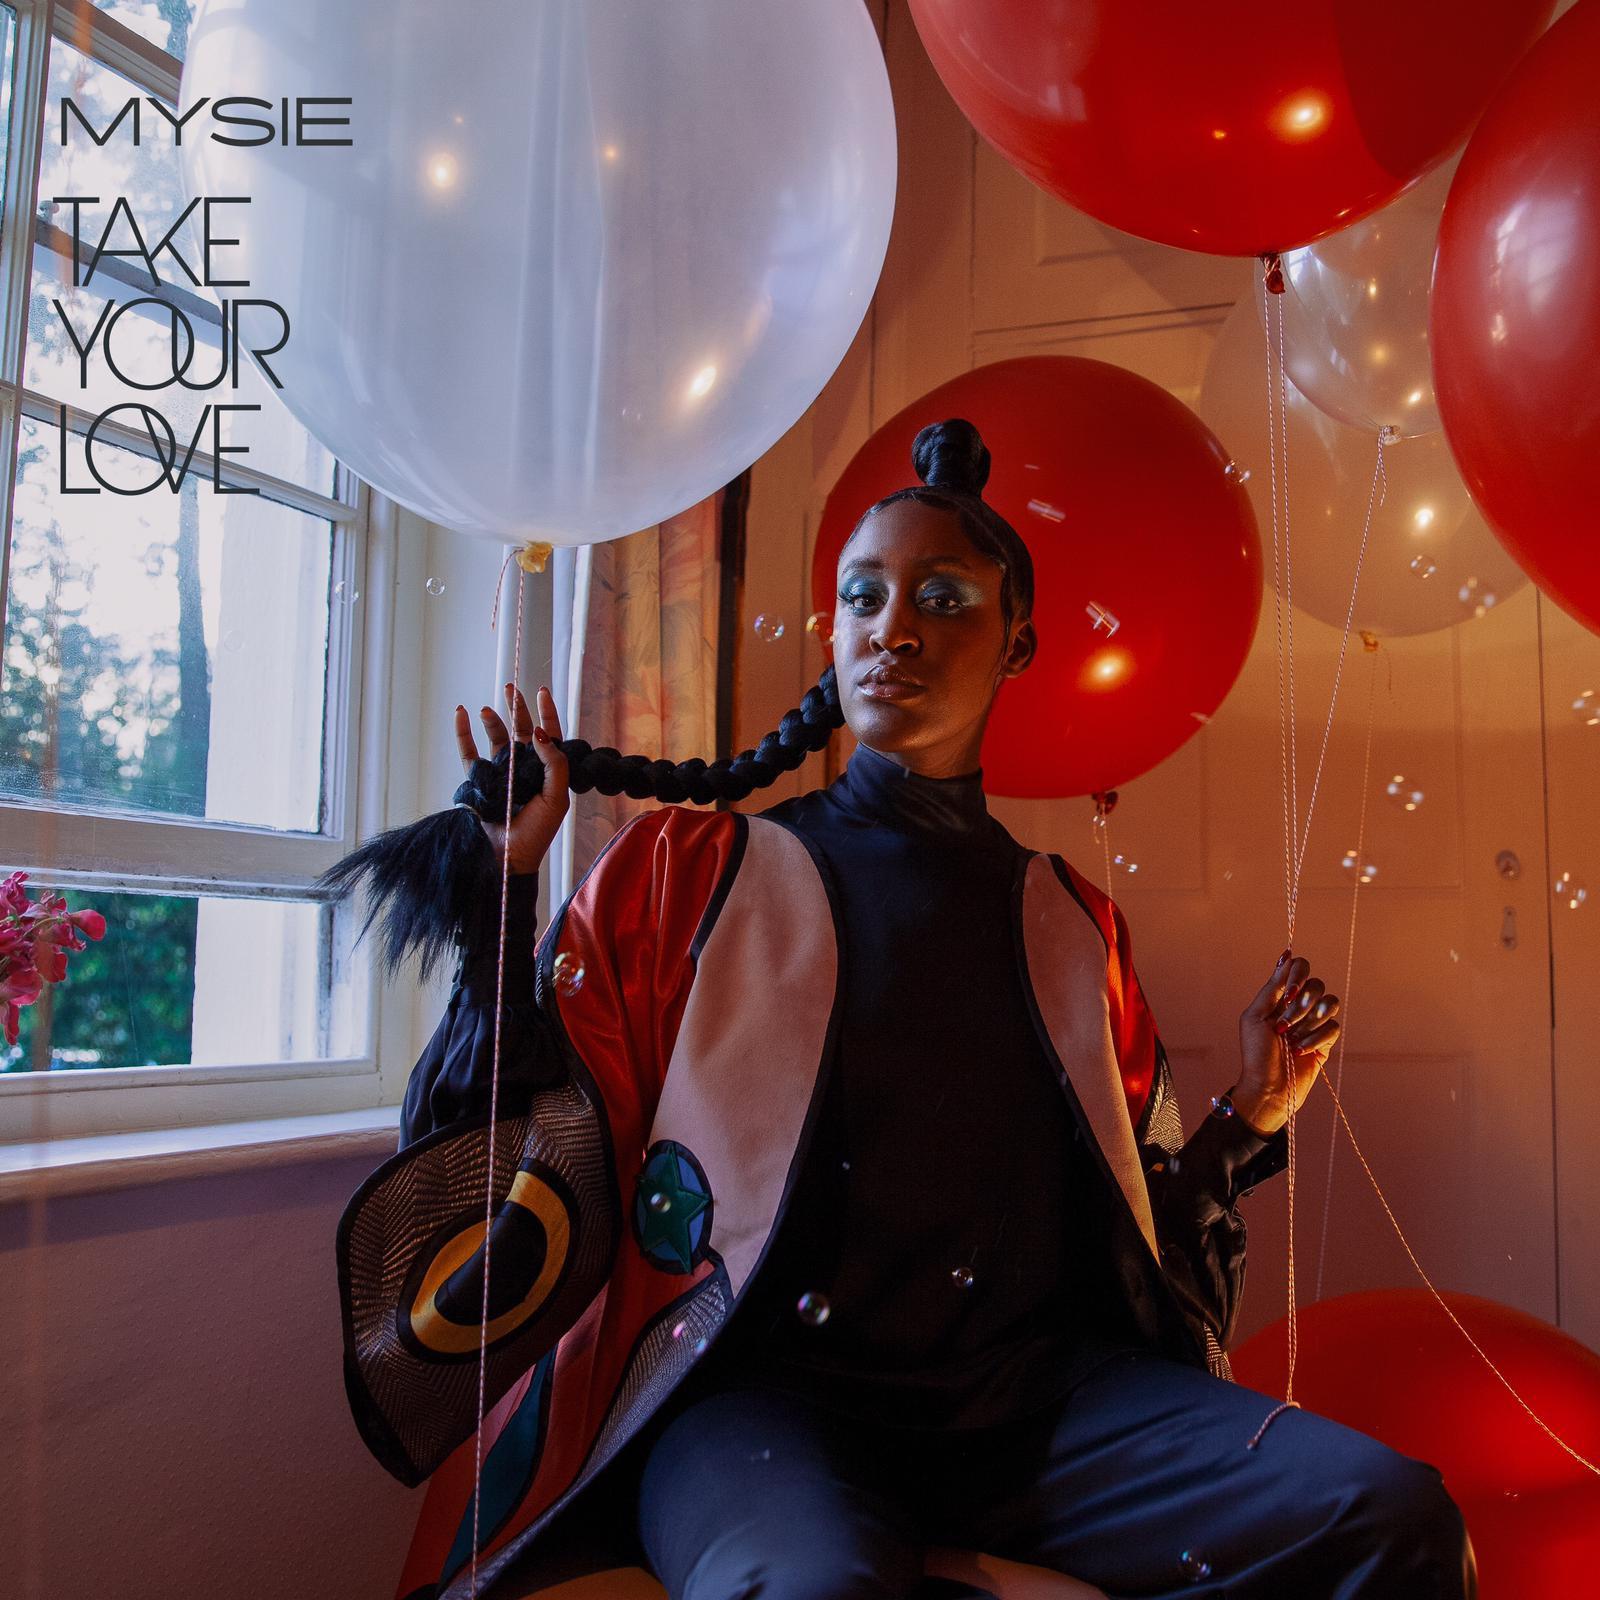 Mysie x Take Your Love Artwork